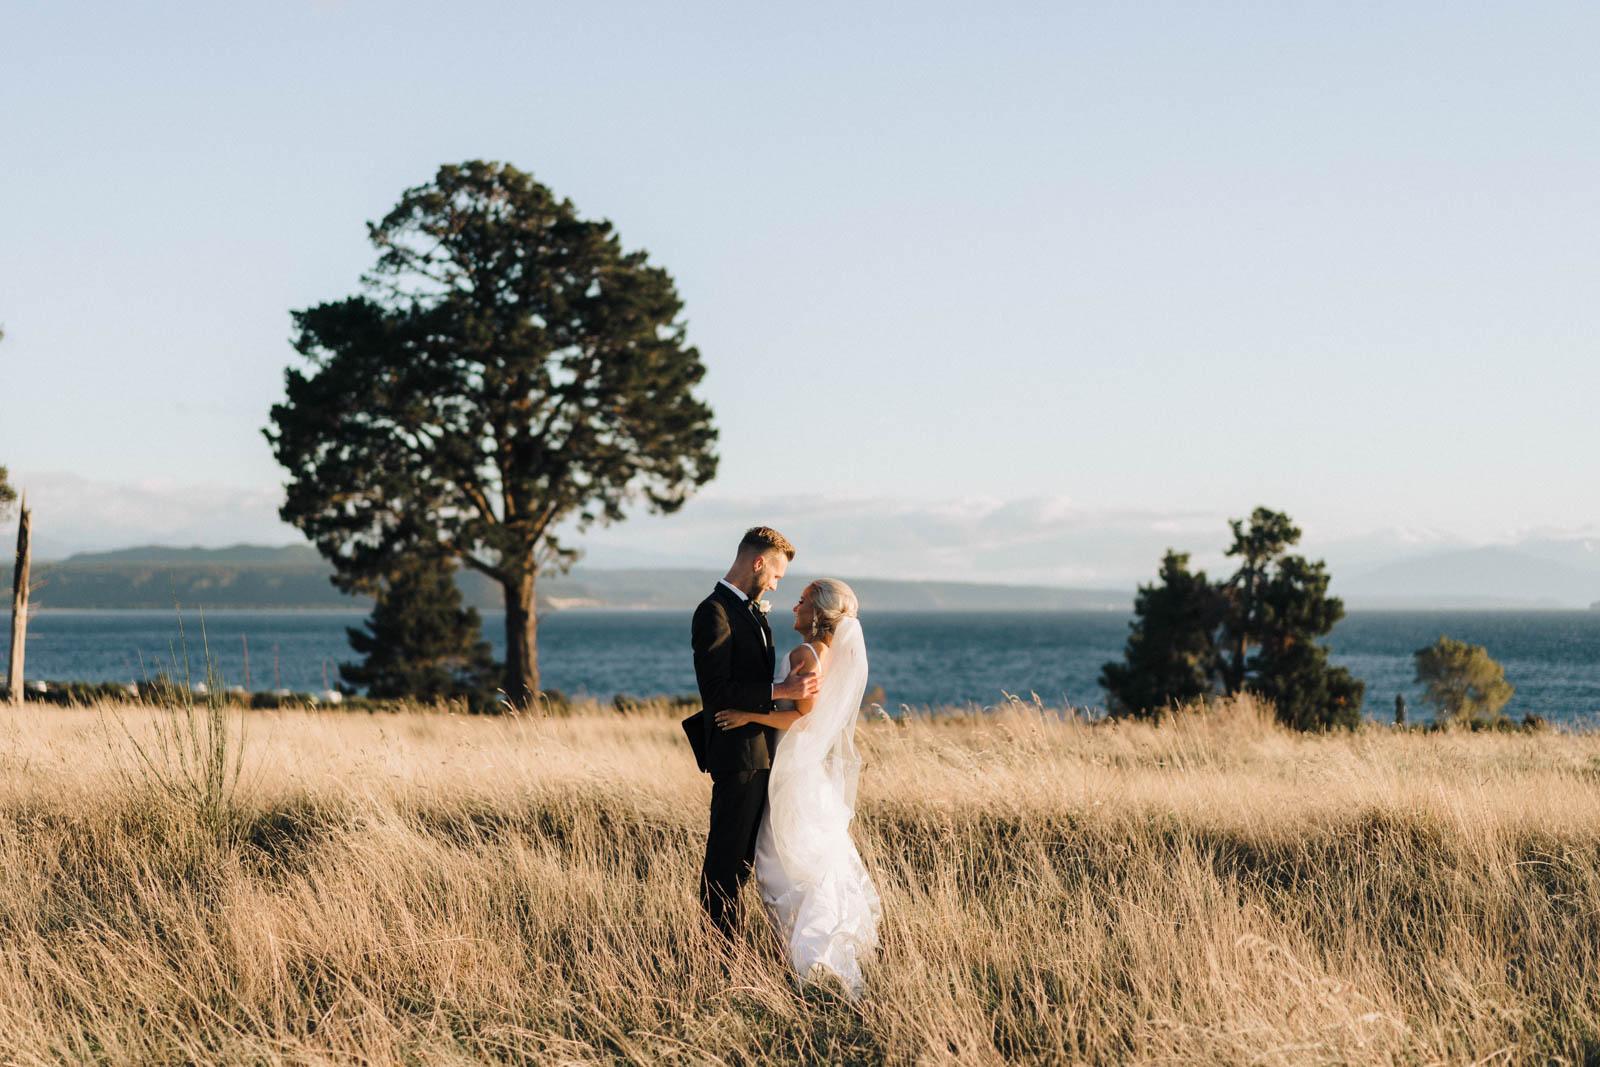 newfound-k-s-hilton-taupo-wedding-photographer-064